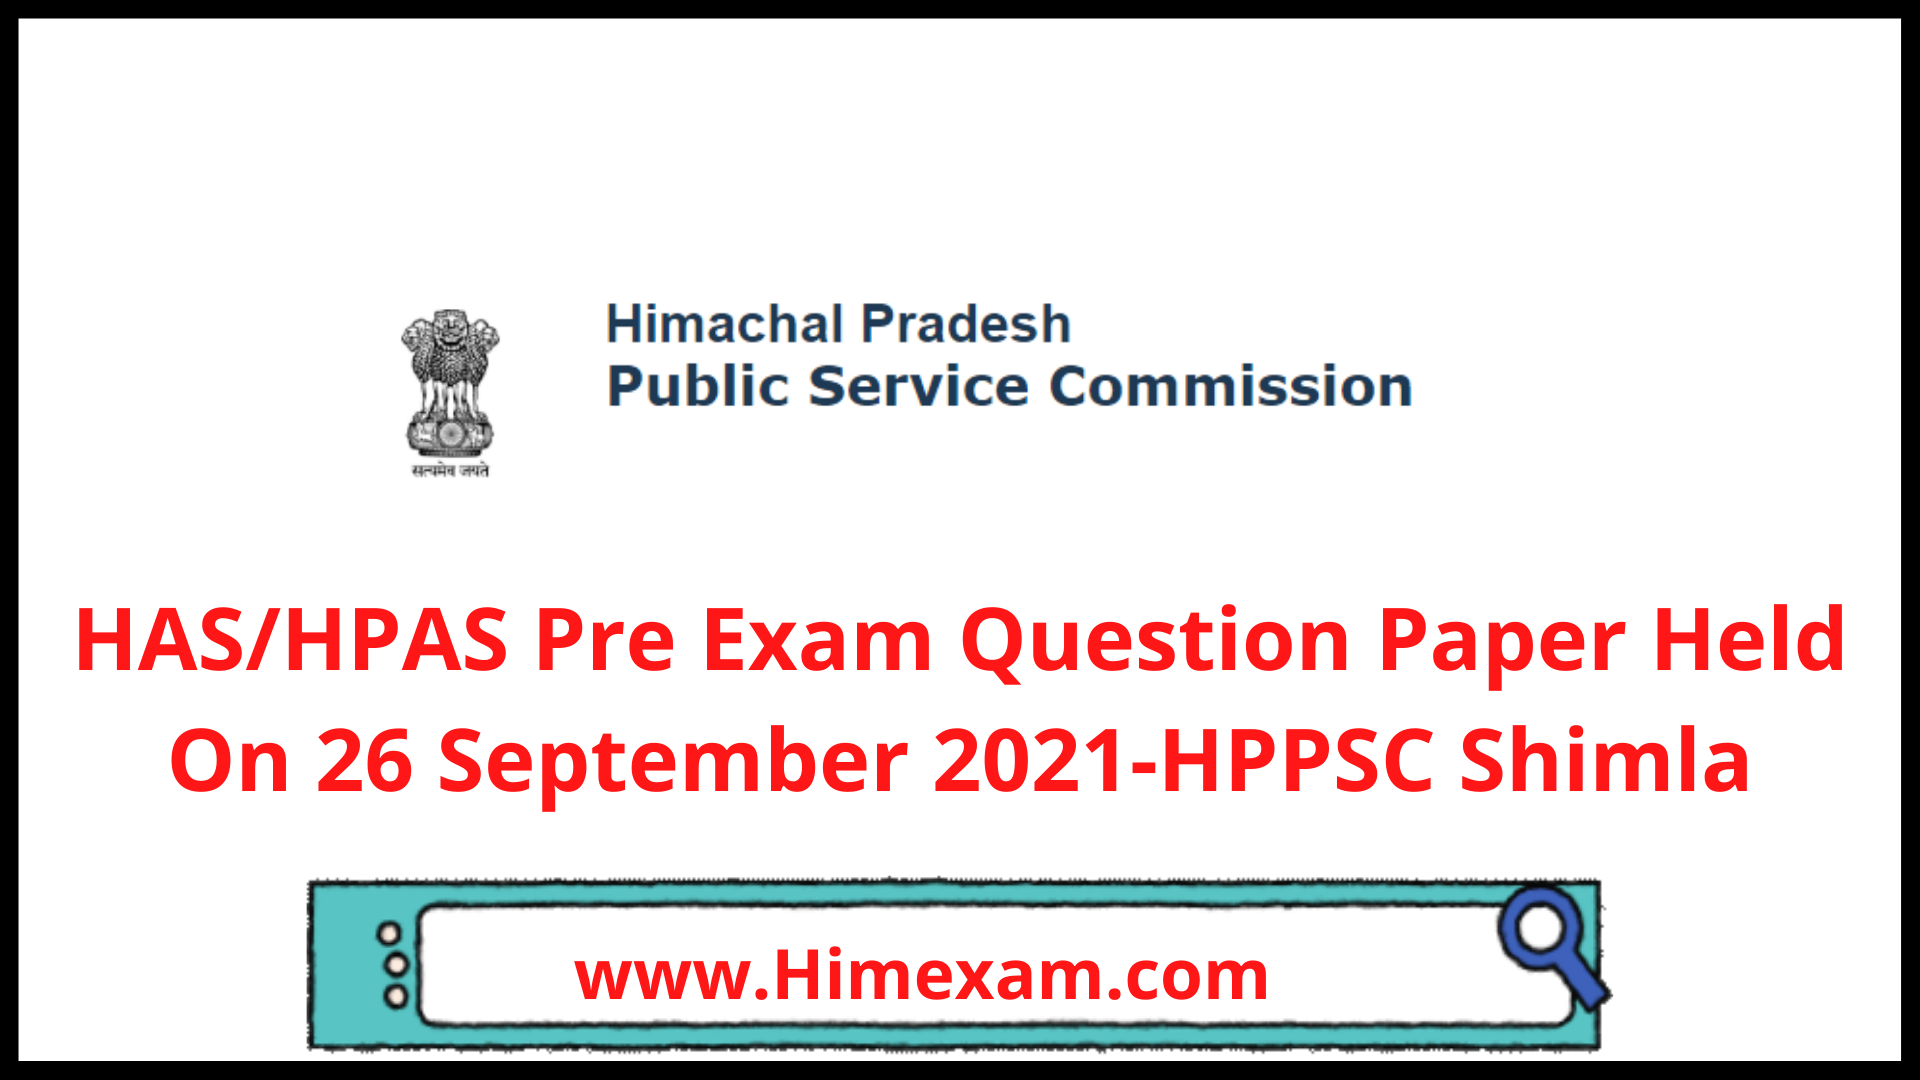 HAS/HPAS Pre Exam Question Paper Held On 26 September 2021-HPPSC Shimla